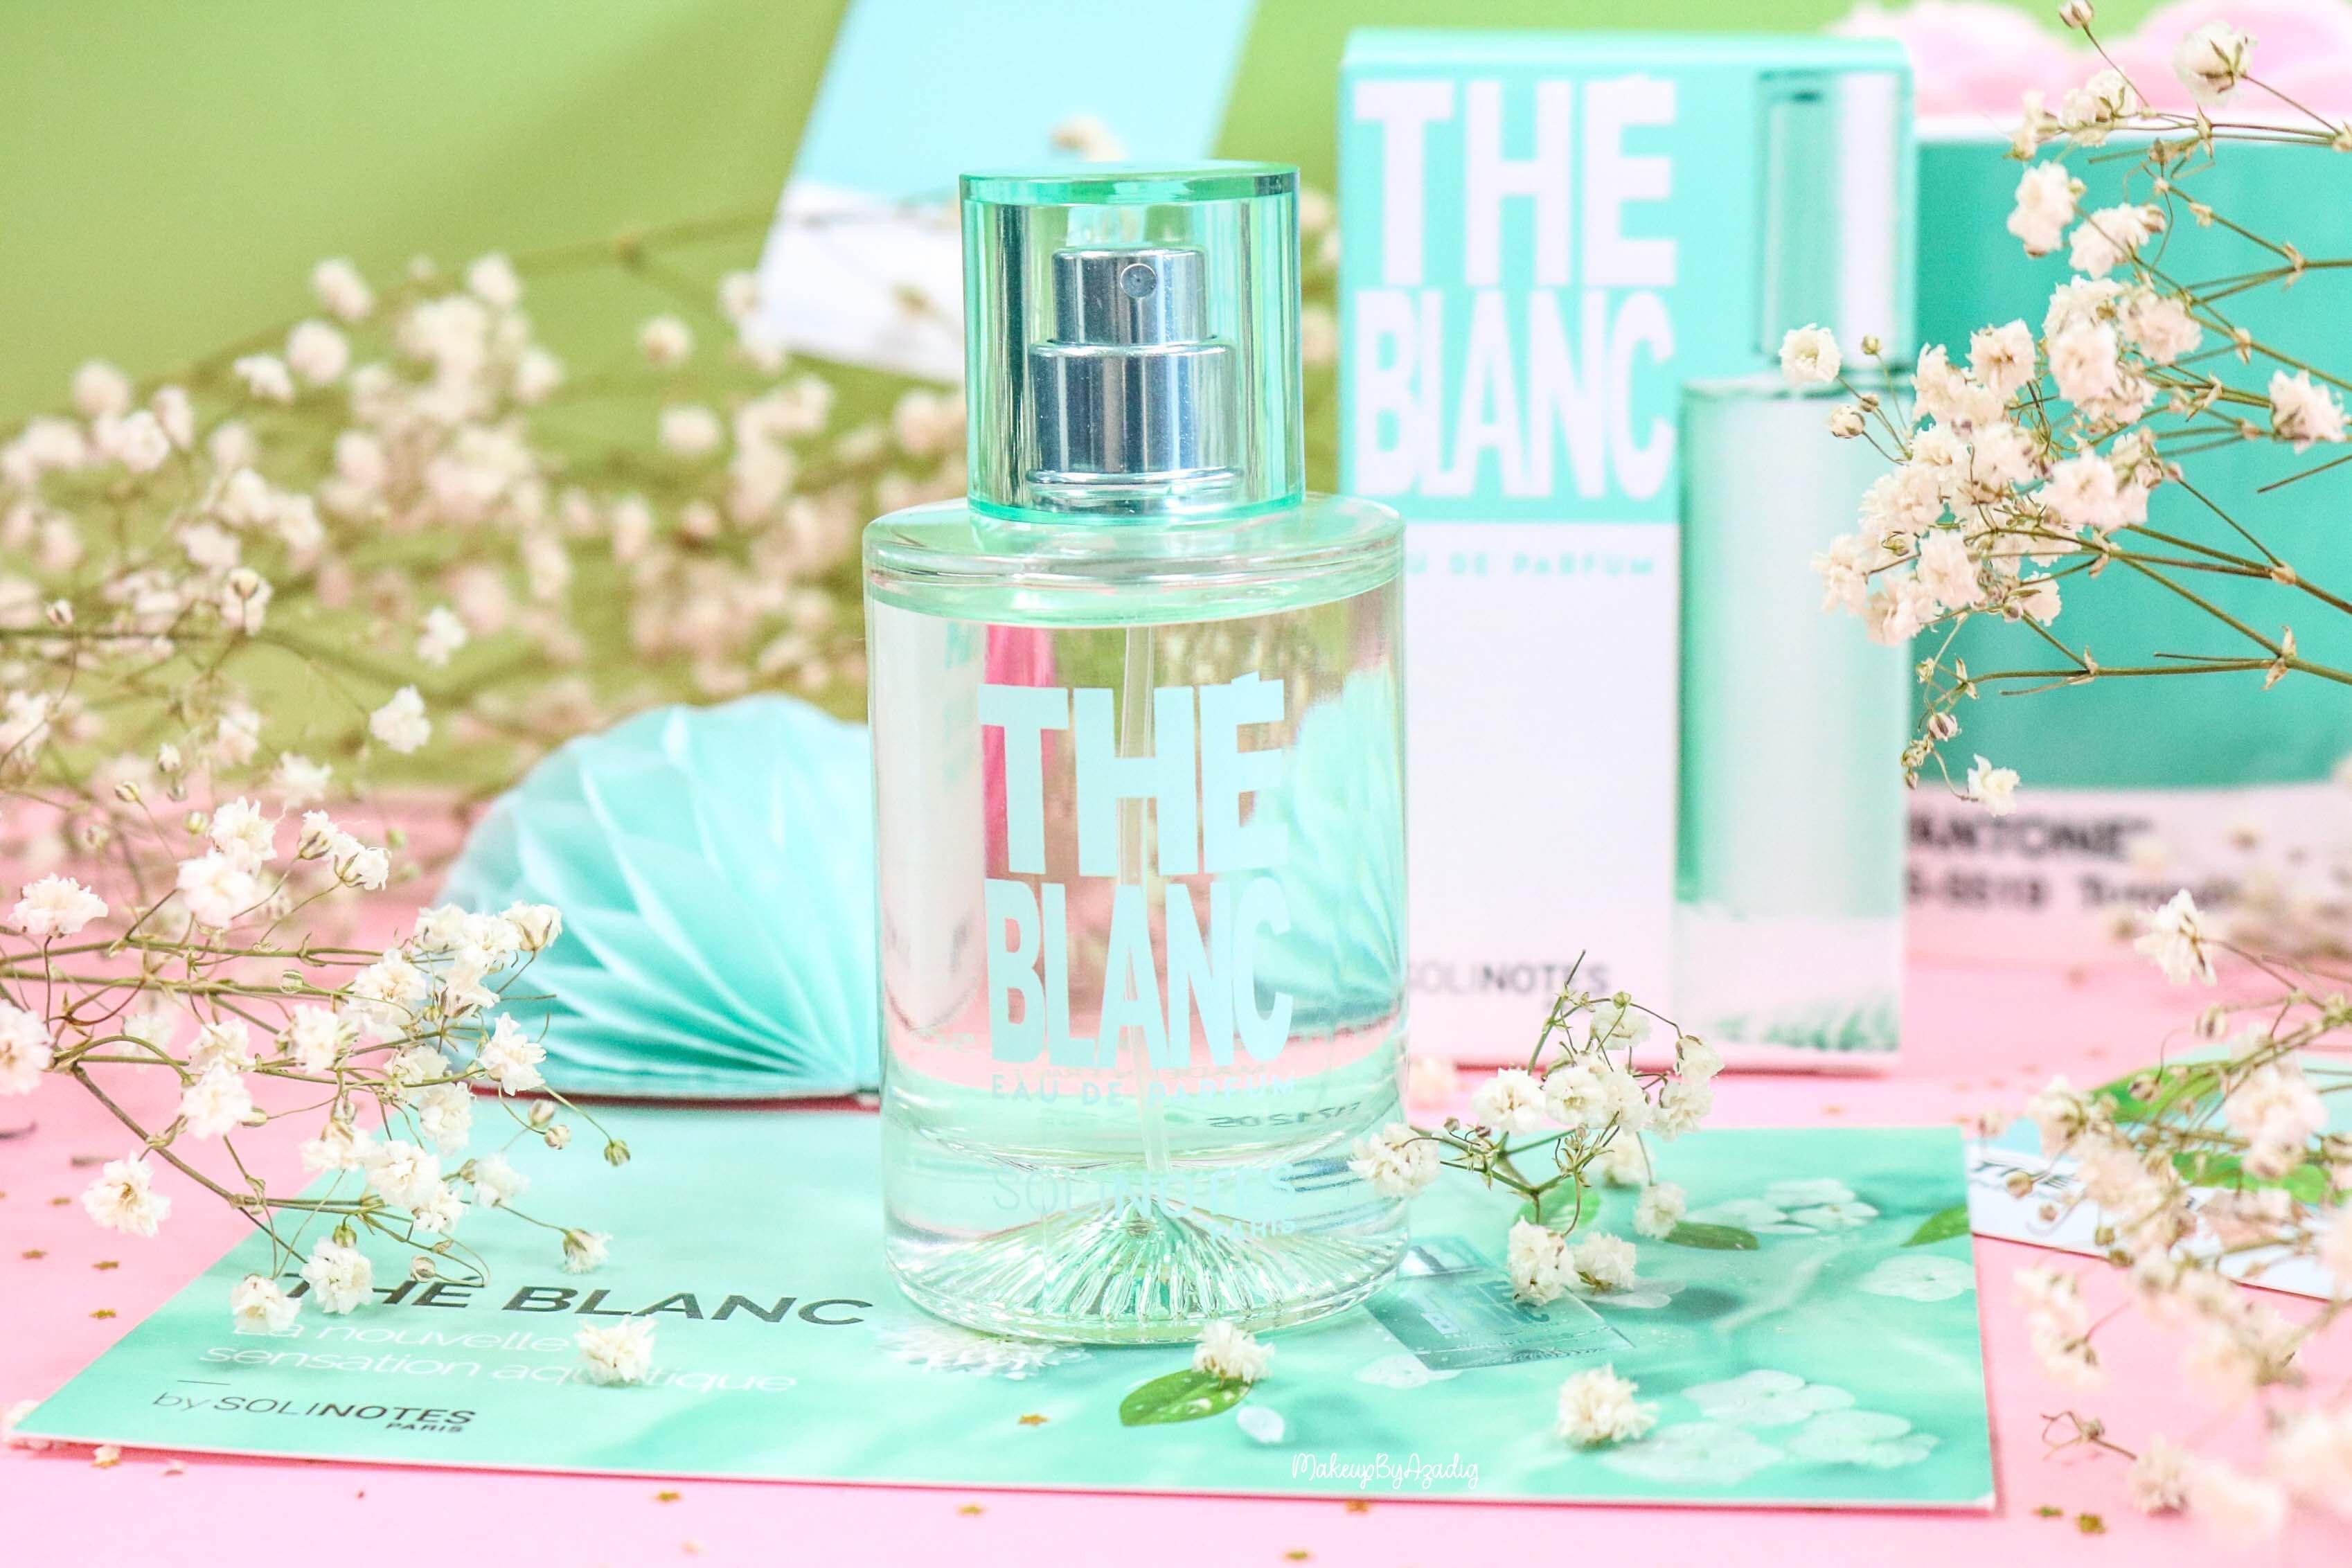 revue-parfum-solinotes-sephora-monoprix-the-blanc-vanille-oranger-prix-pas-cher-promo-makeupbyazadig-eau